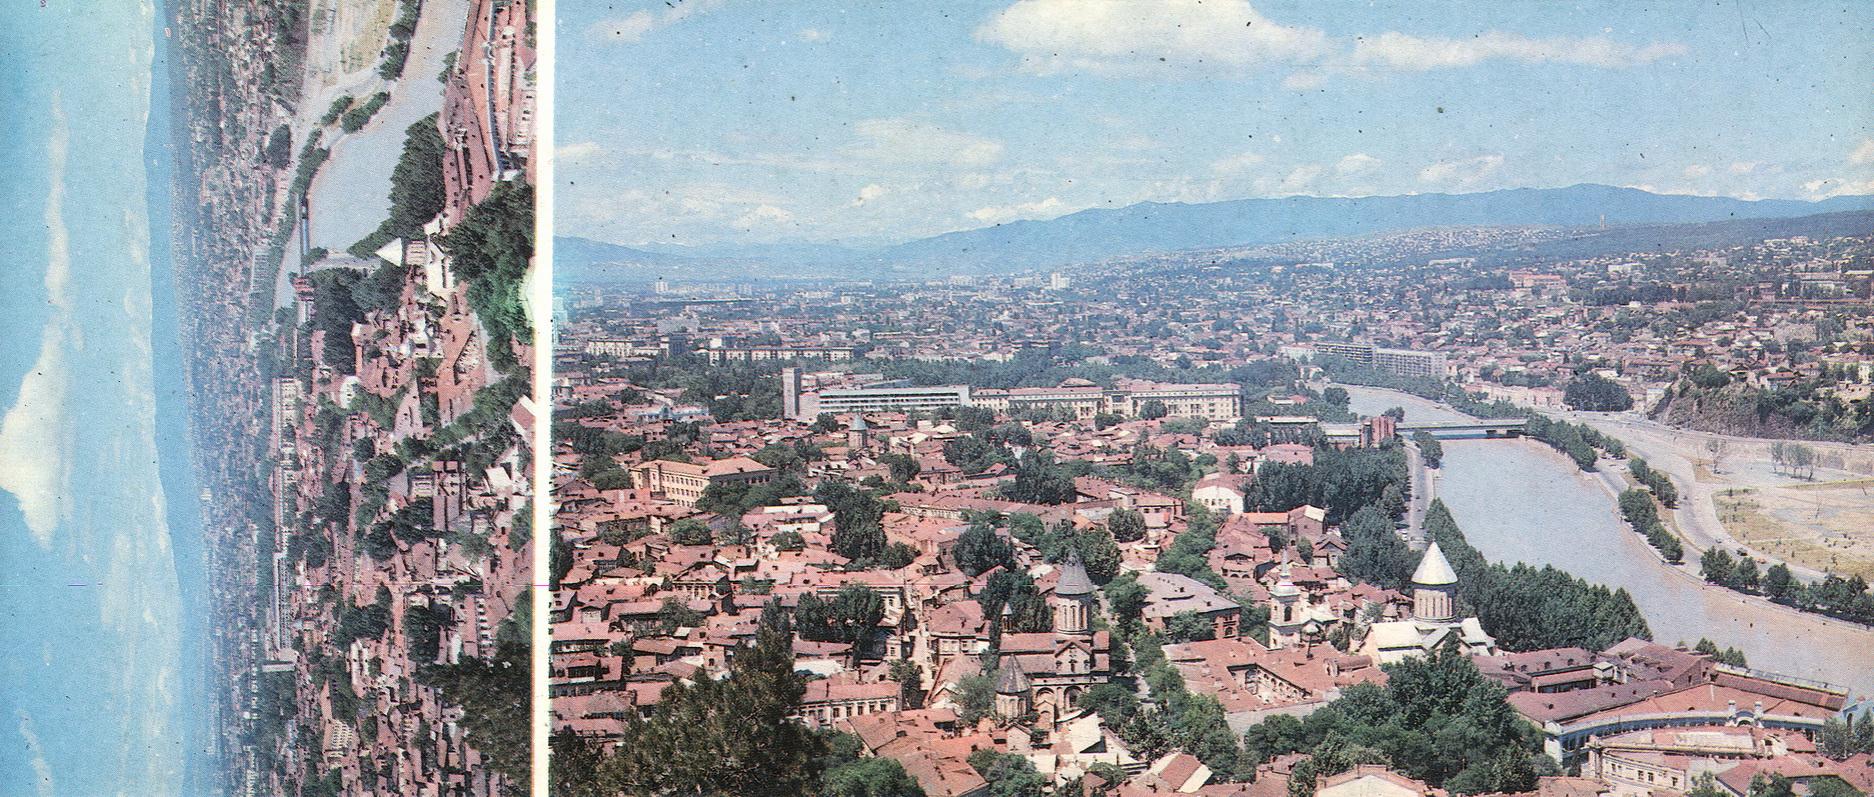 Tbilisi - Panorama goroda 02_resize